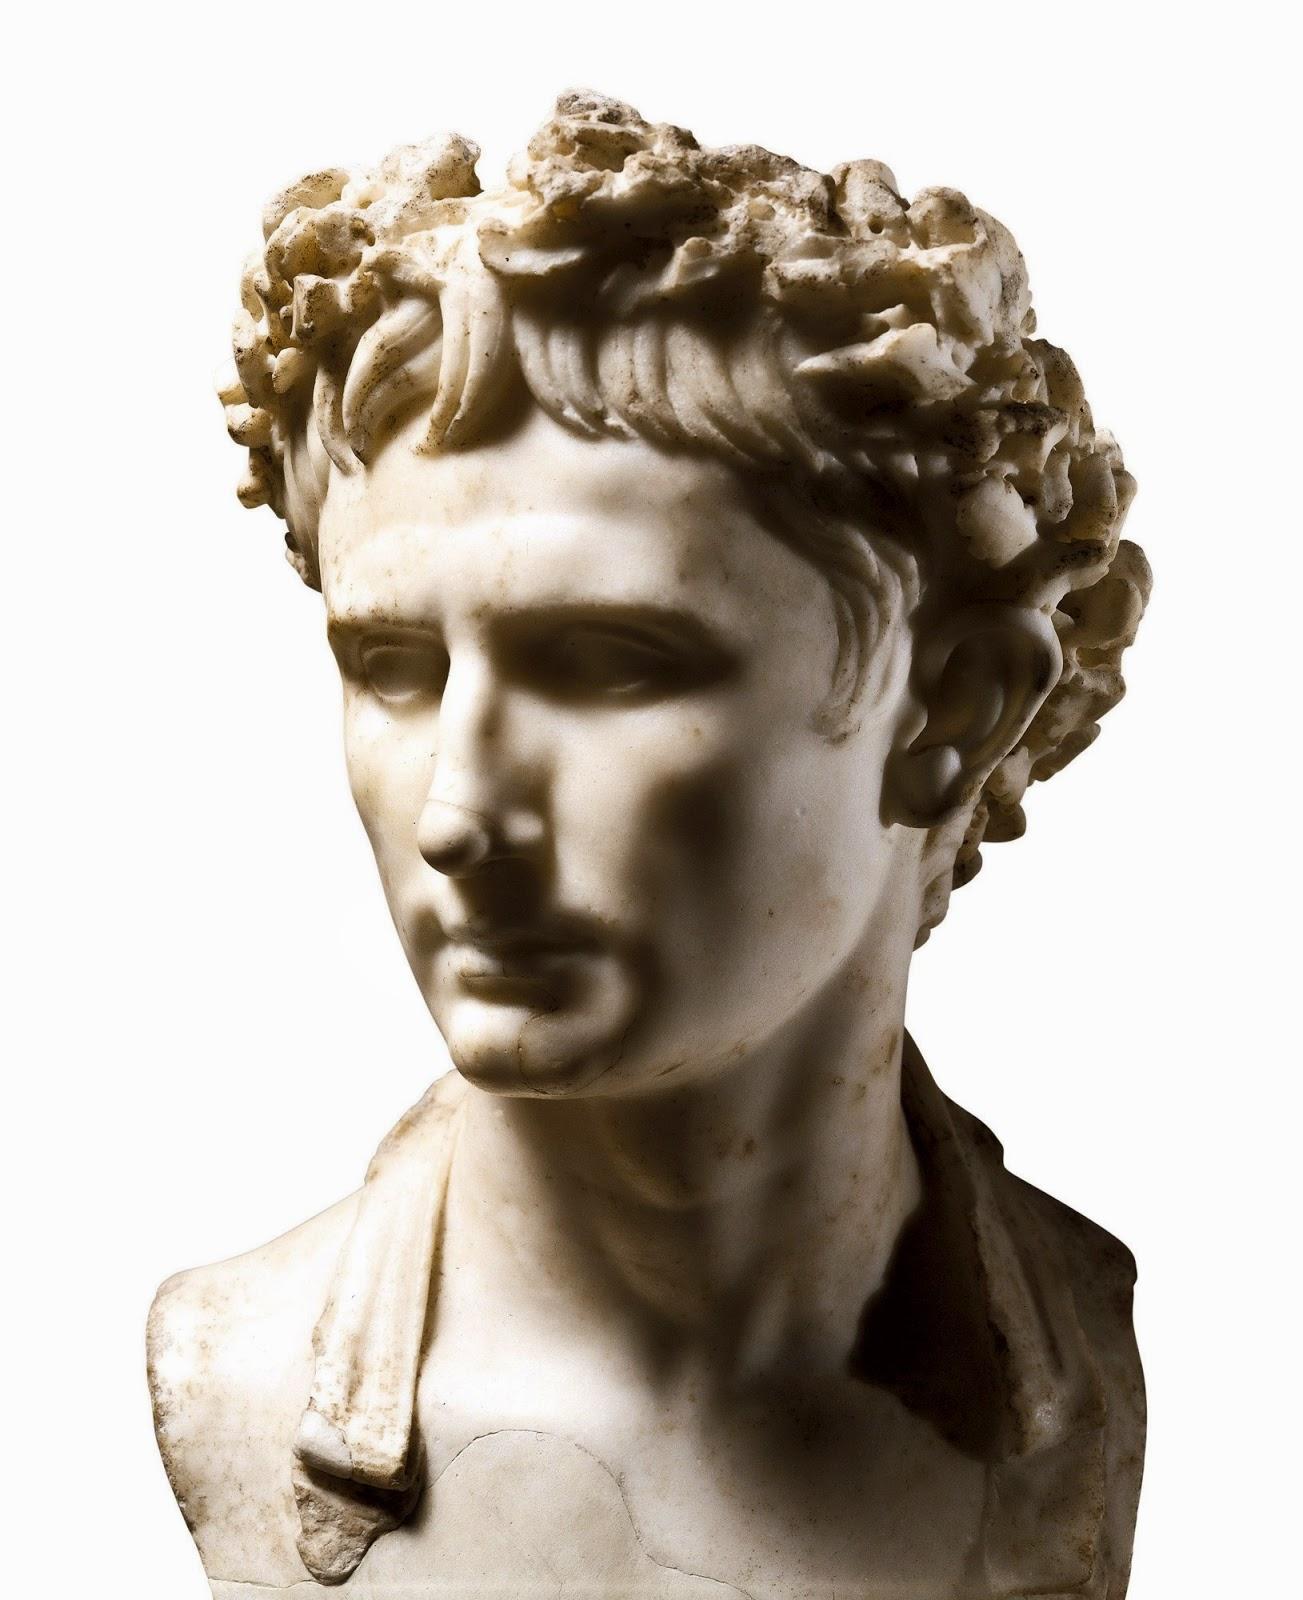 The 1st Roman Emperor